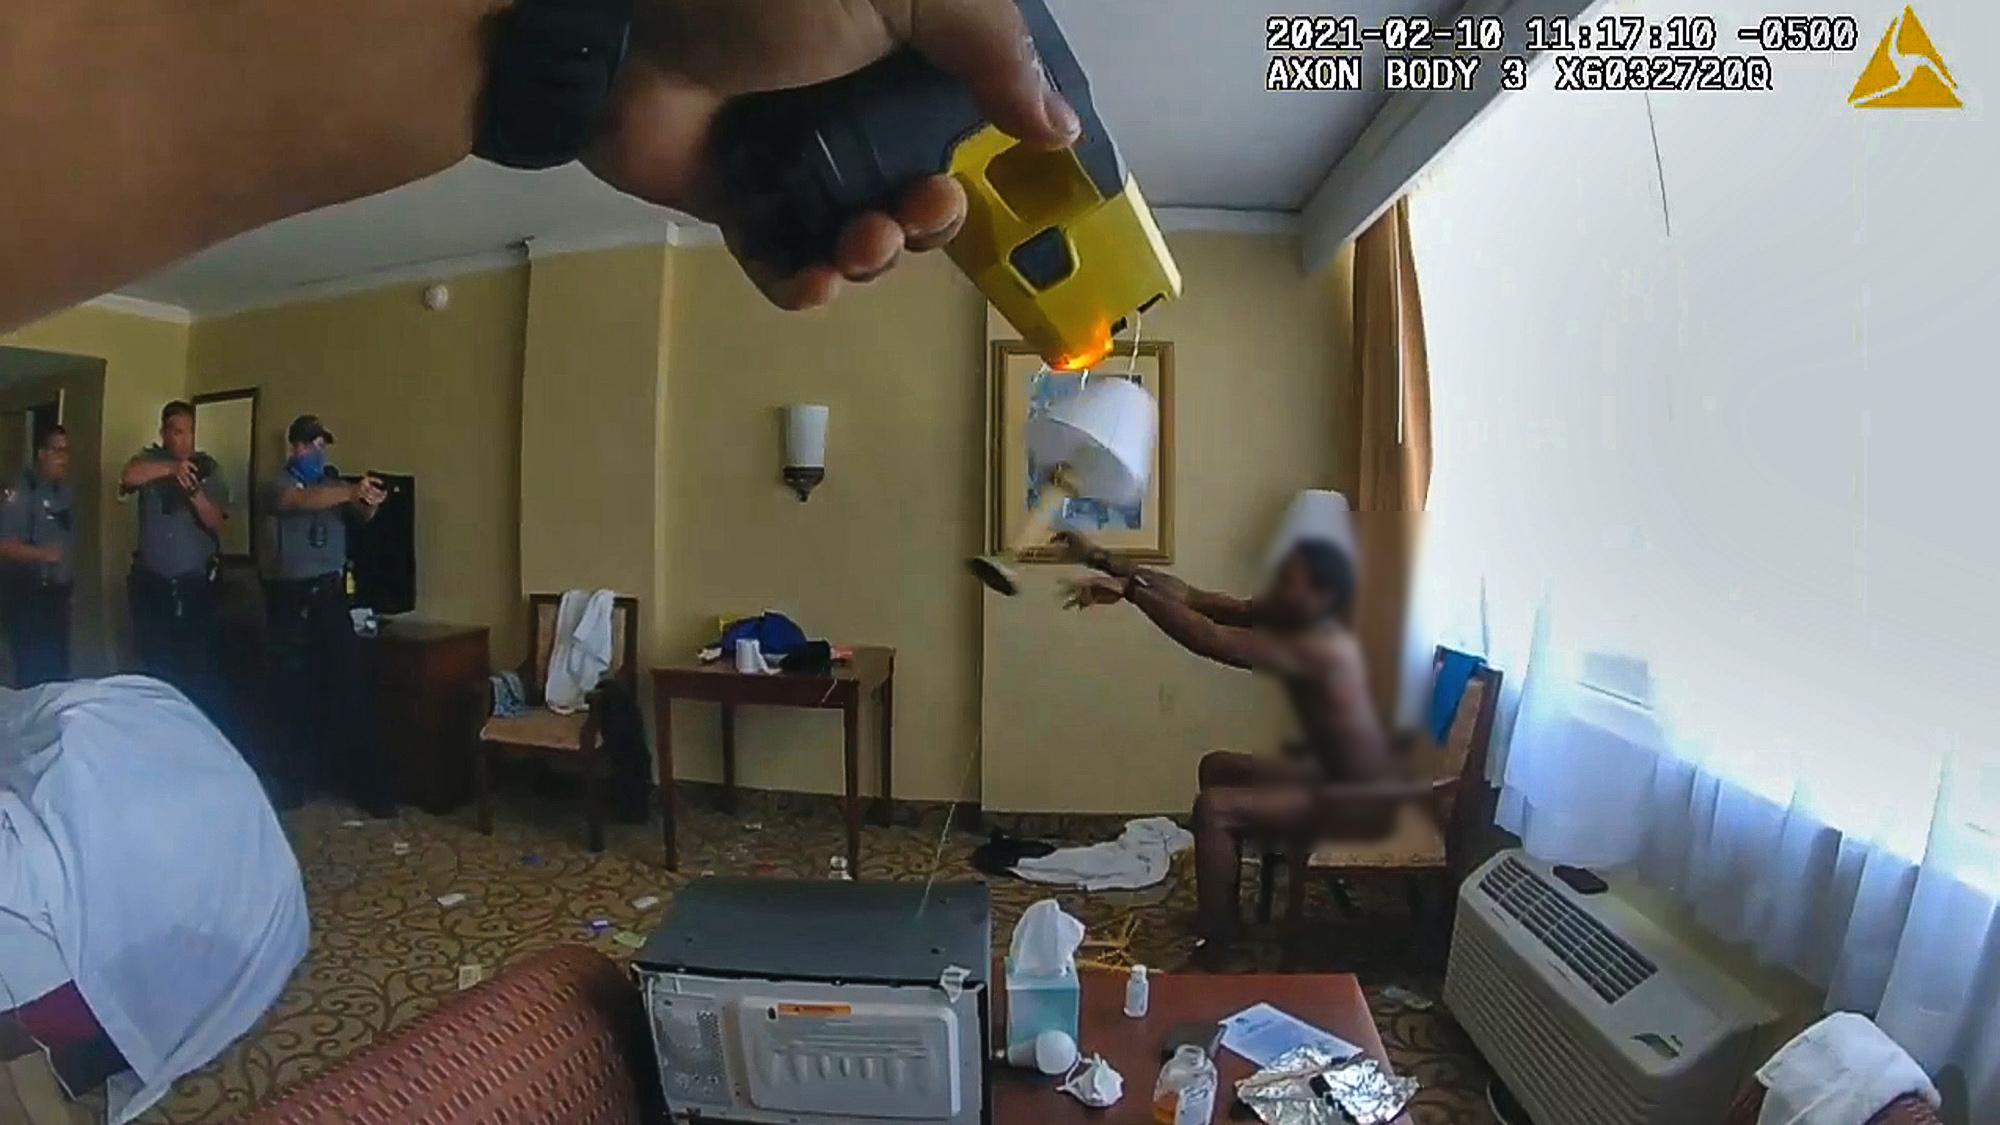 Daytona Beach Officers Detain Armed Man In Florida